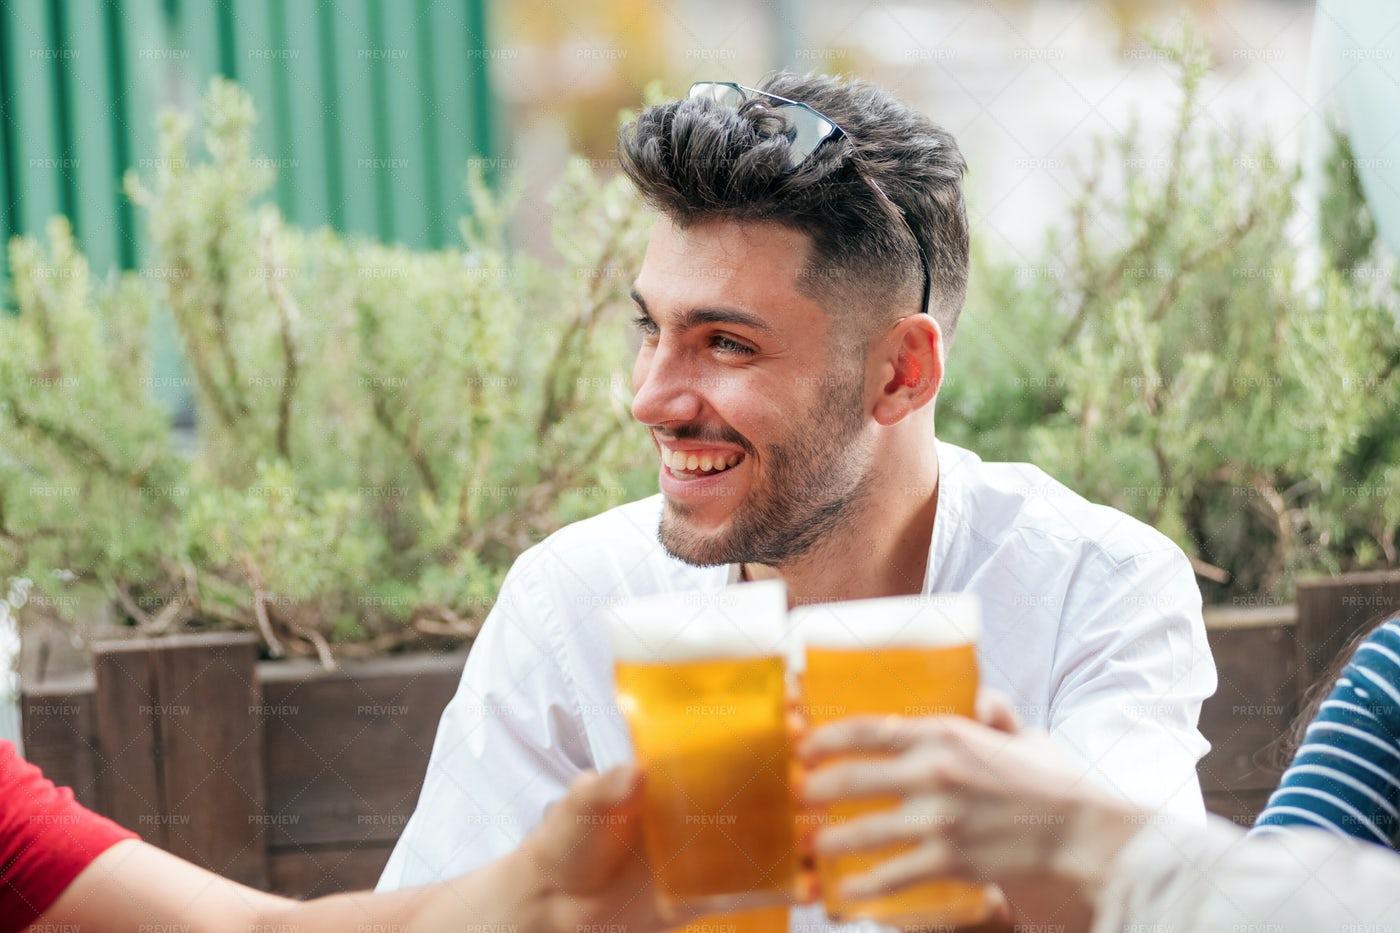 Smiling Man Celebrating: Stock Photos